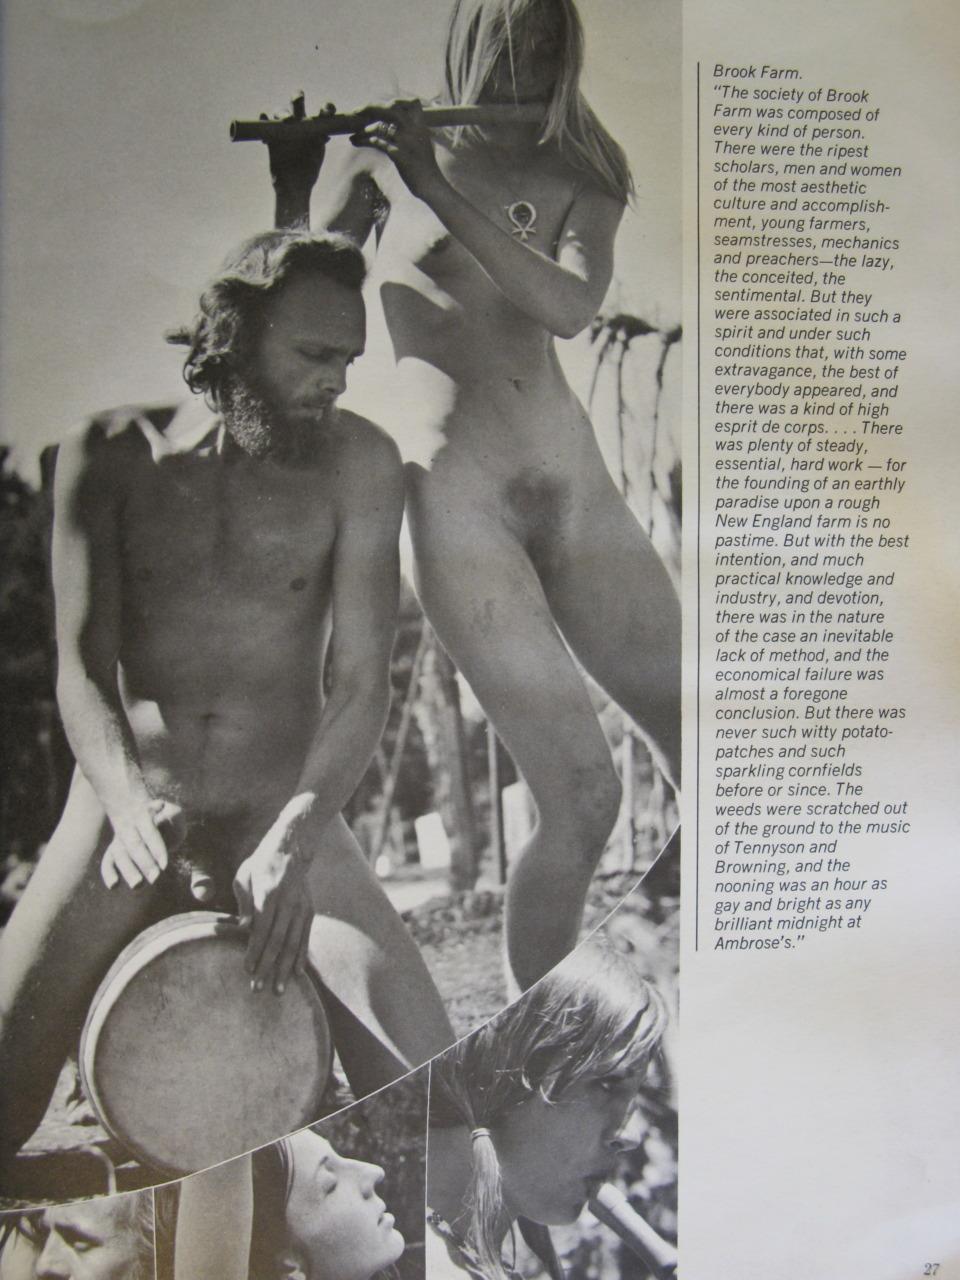 https://www.nudismlife.com/galleries/nudists_and_nude/the_most_natural_nudists/the_most_natural_nudists_0456.jpg